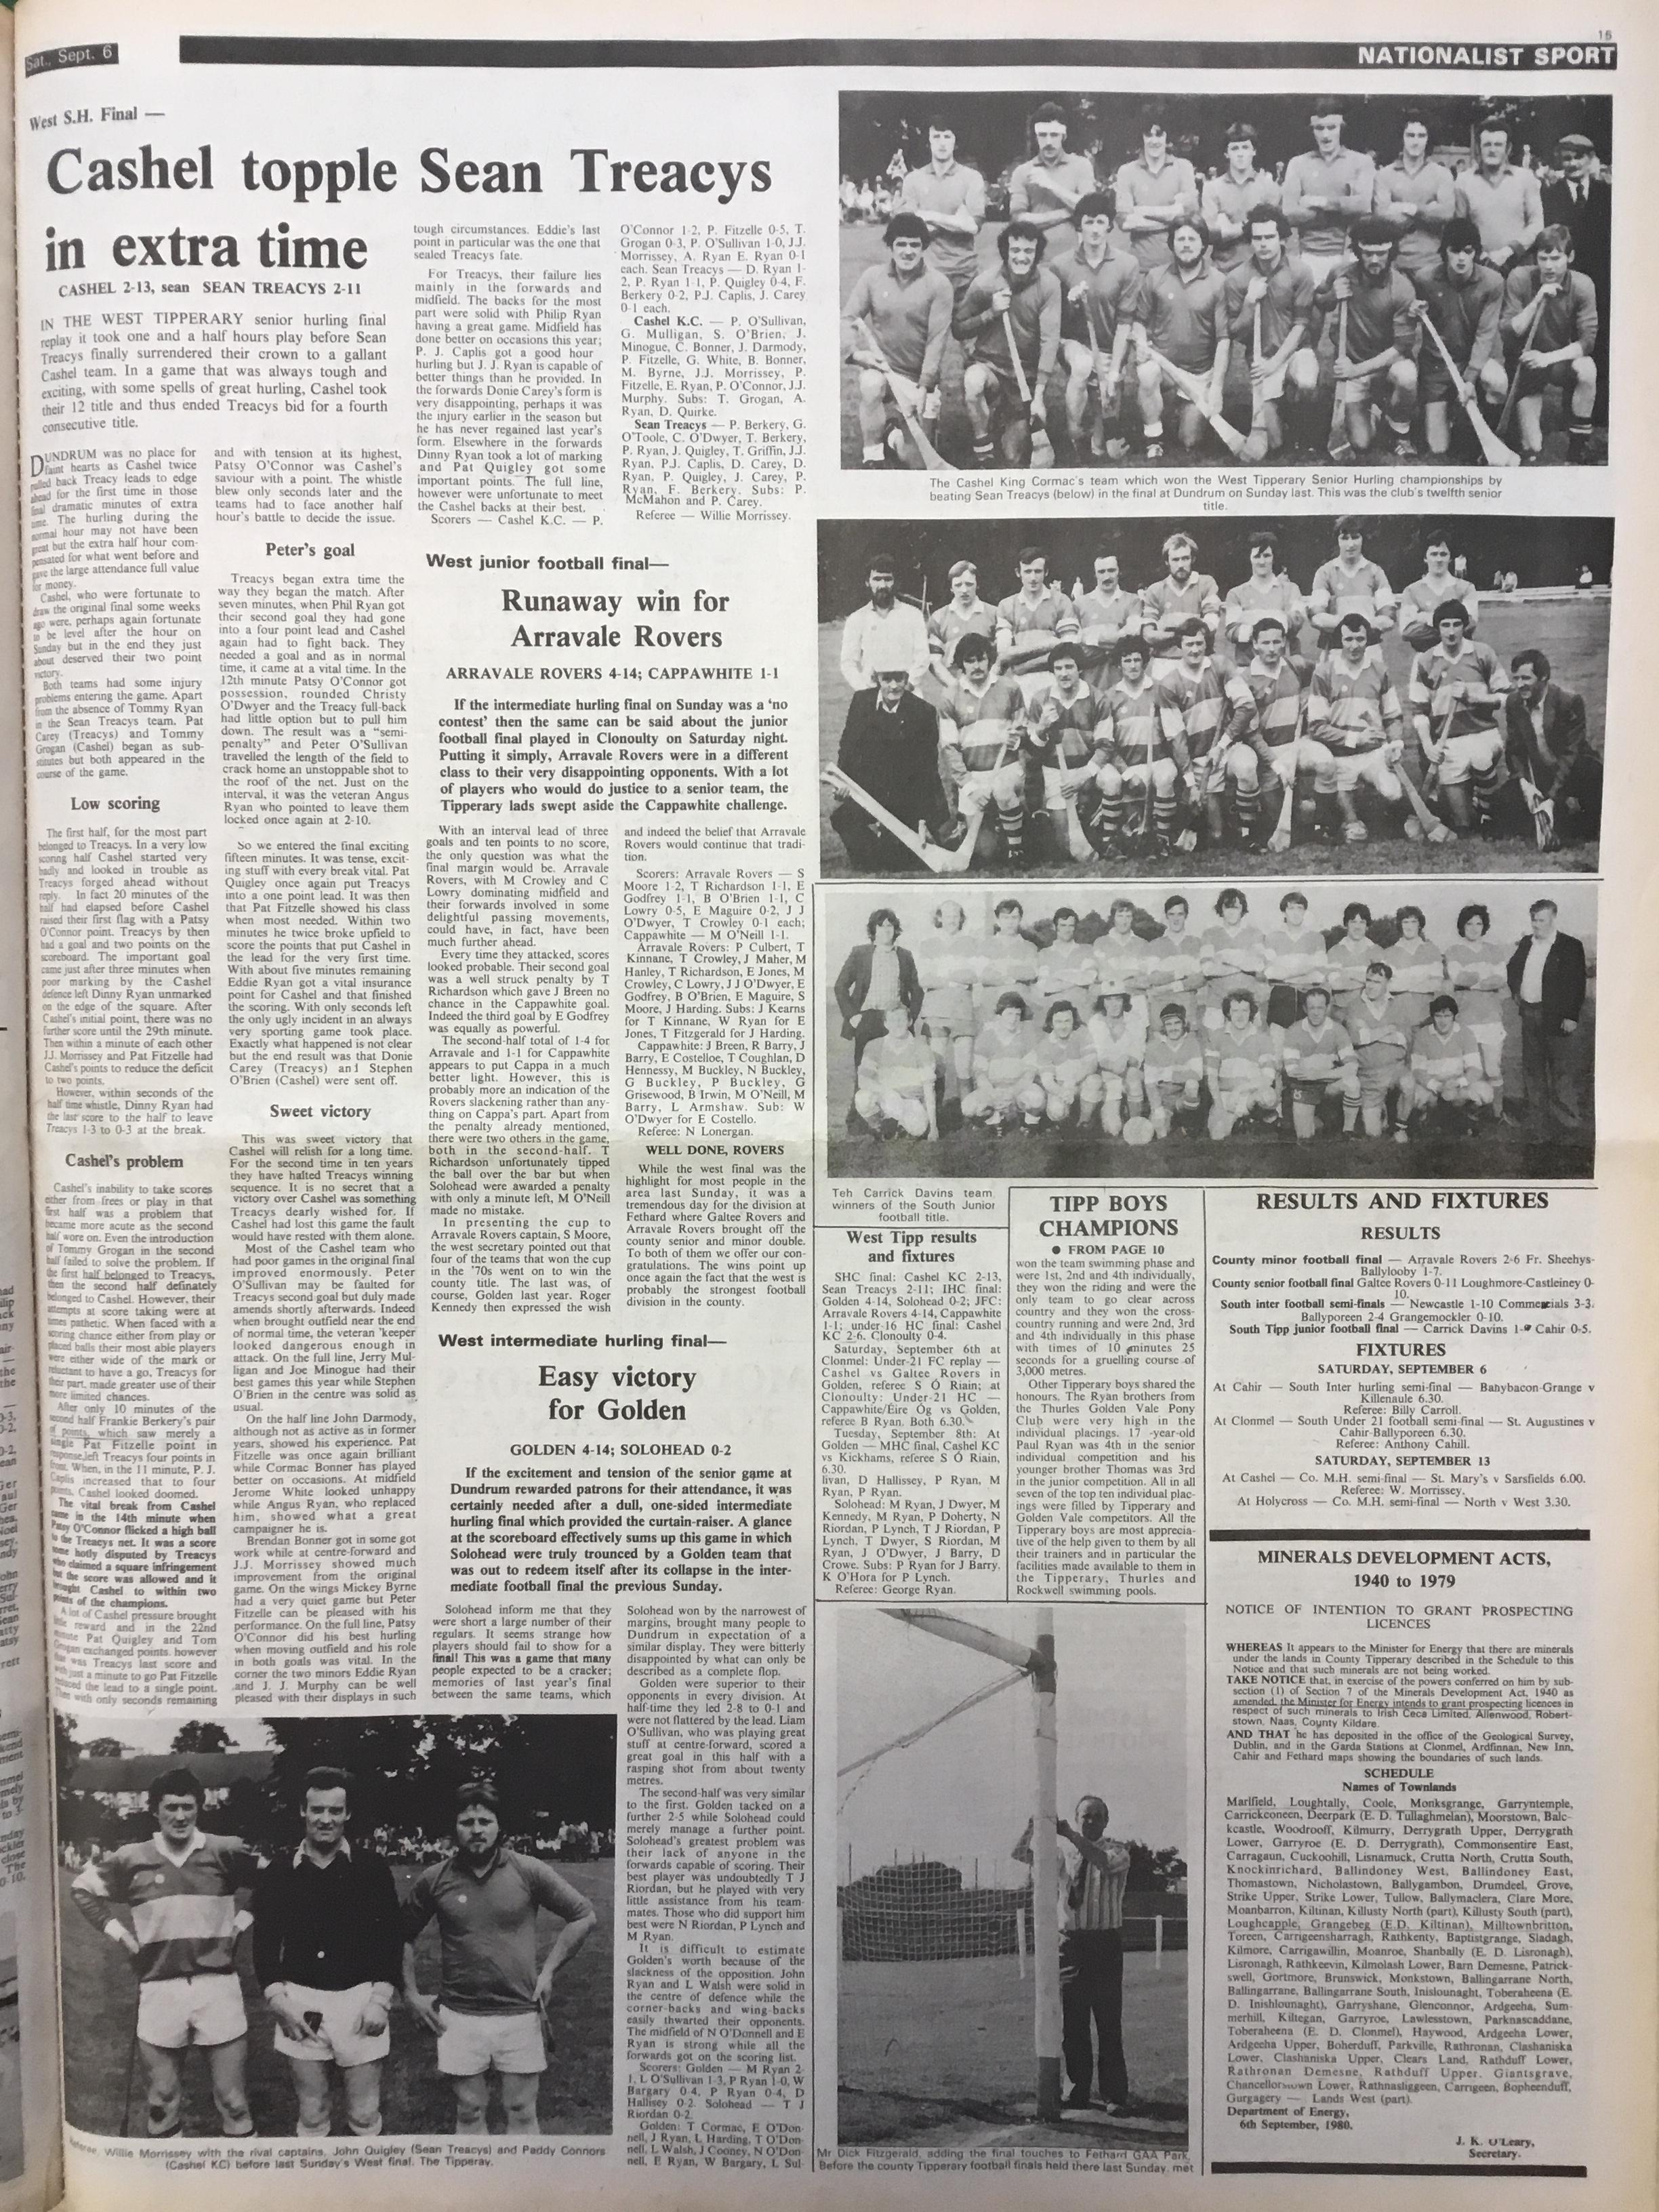 1980 West hurling final replay